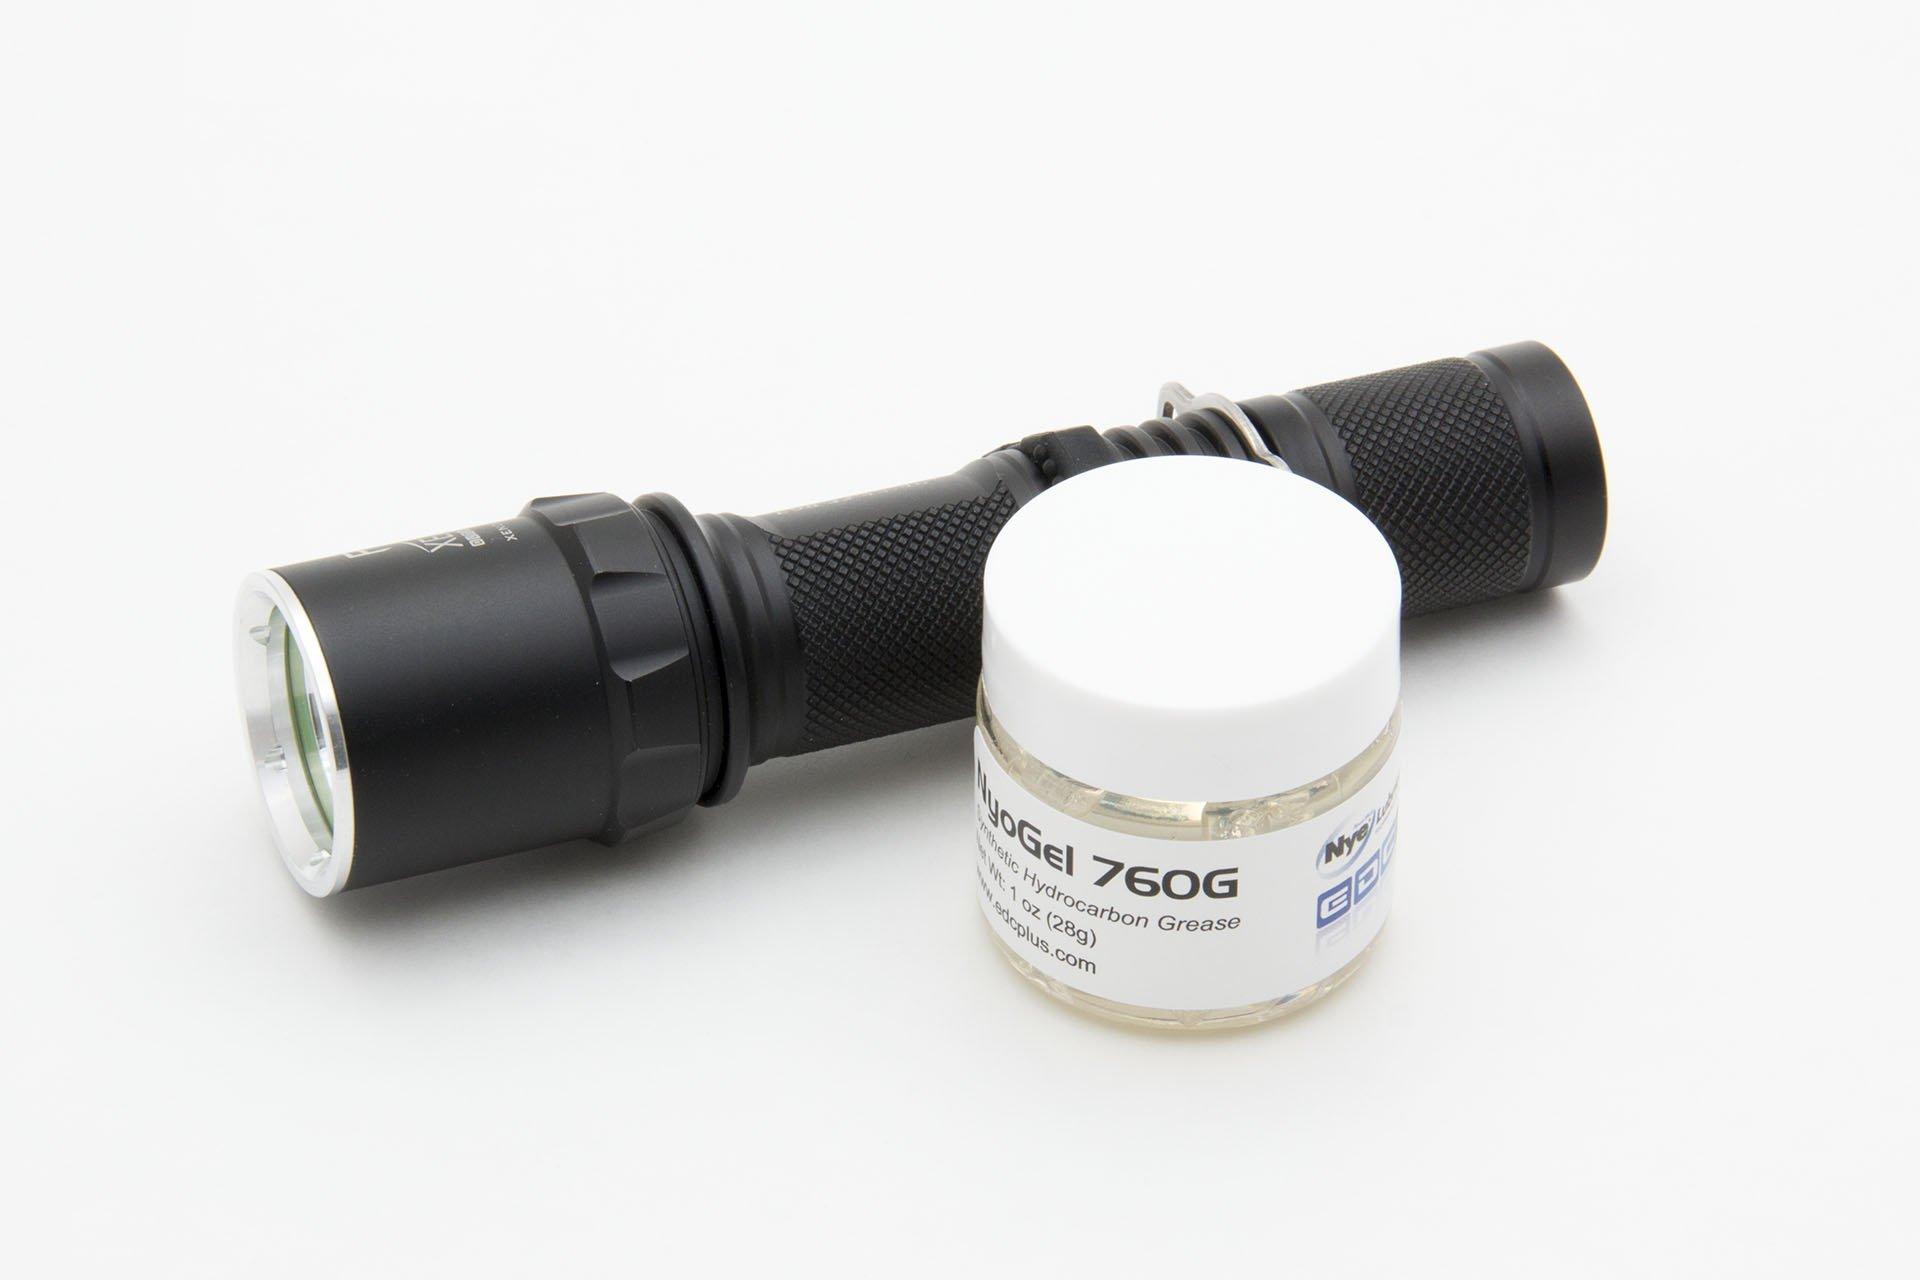 NyoGel 760G Synthetic Flashlight Silicone Lubricant grease 1oz Jar